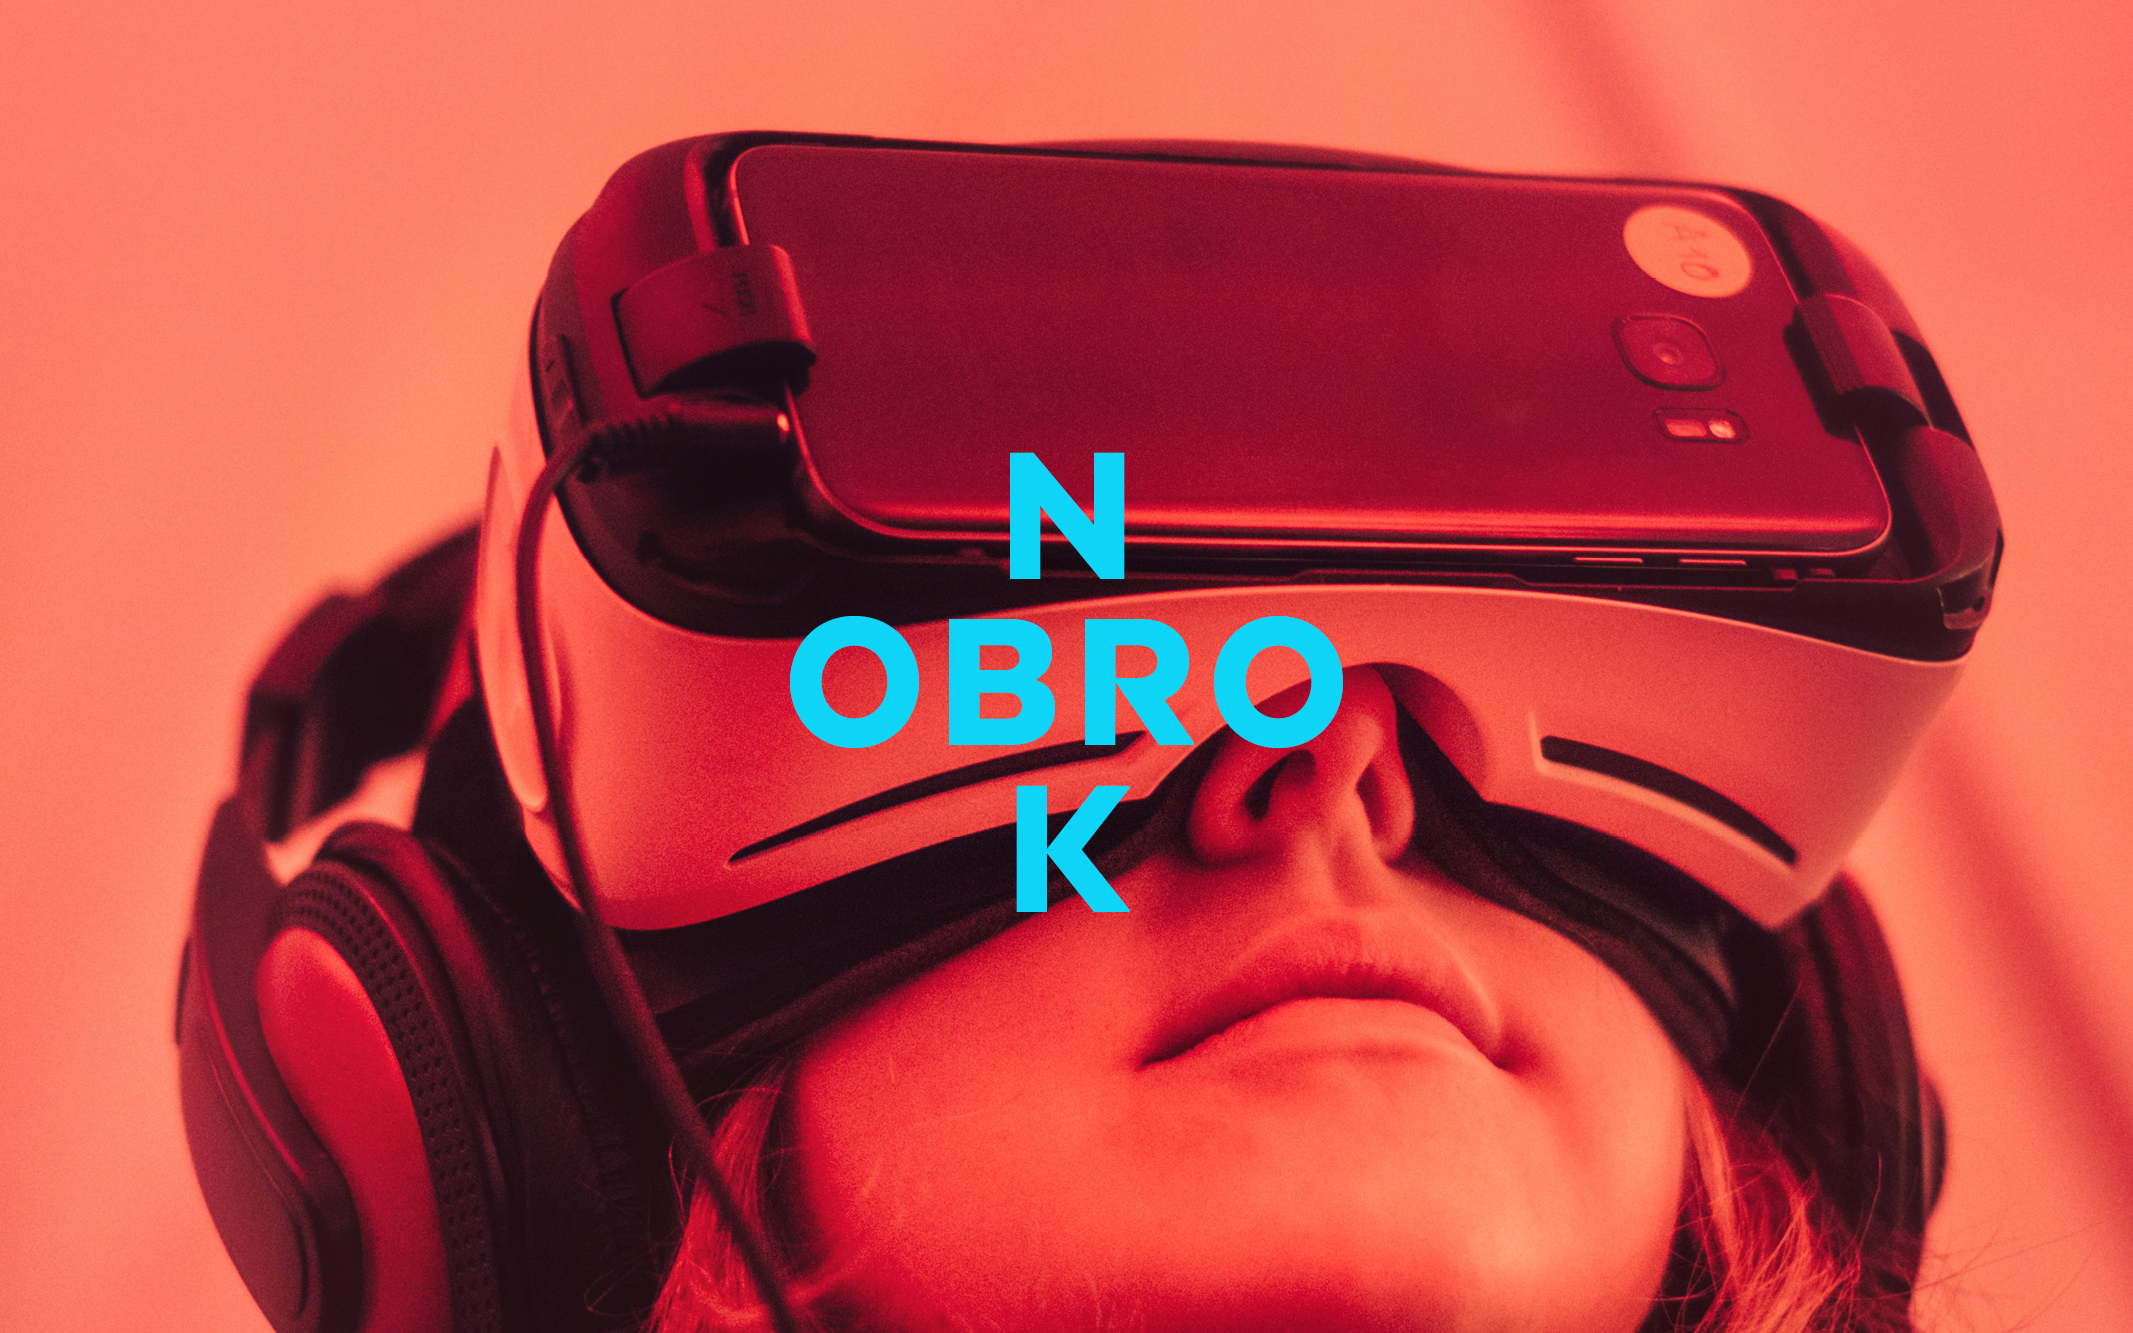 Nobrokkoli – Poarangan Brand Design !9